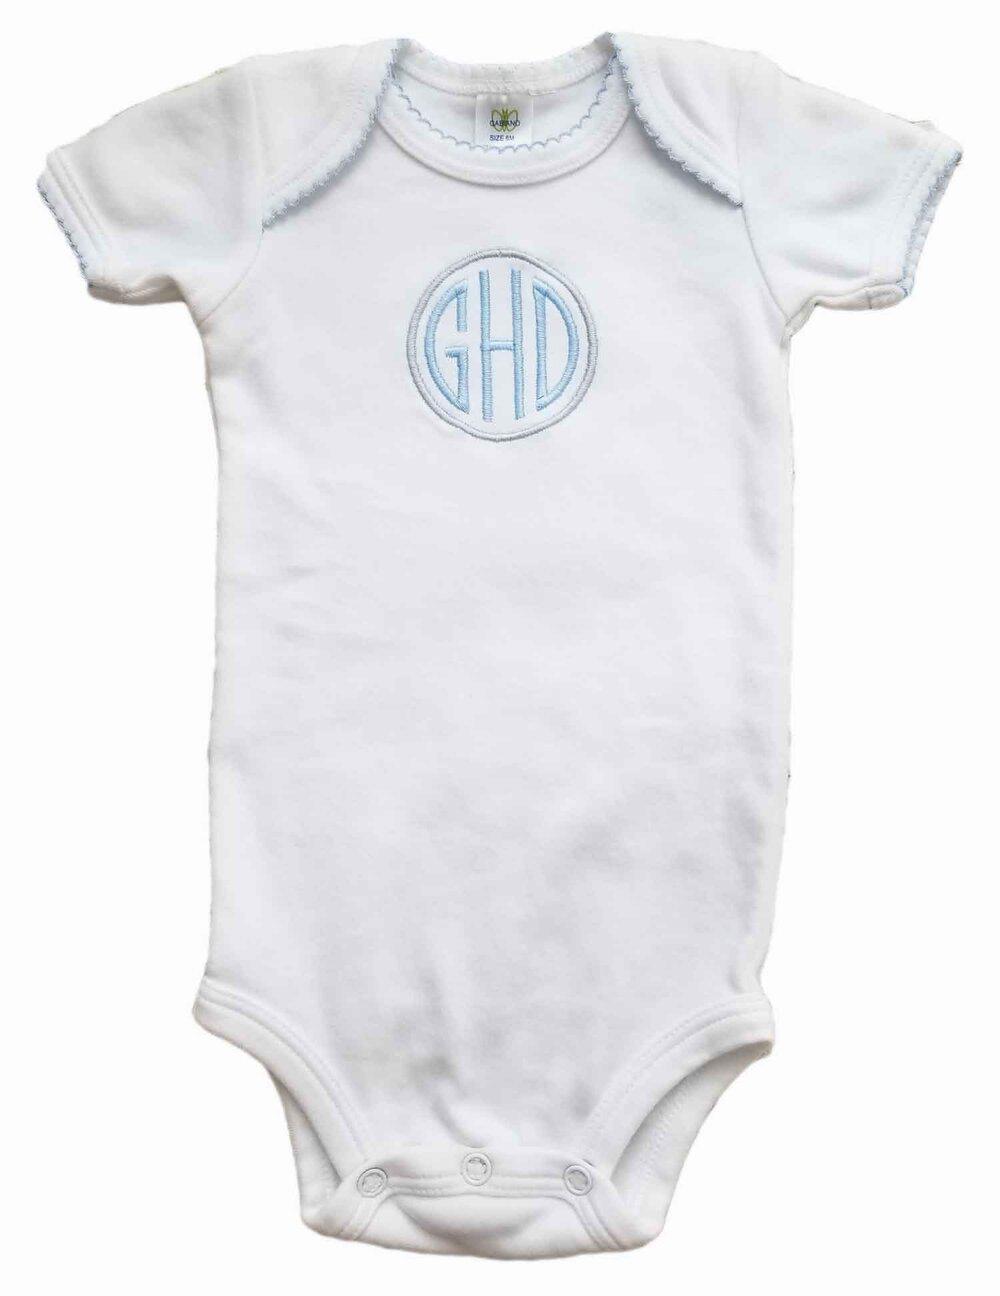 Monogrammed baby boy bodysuit